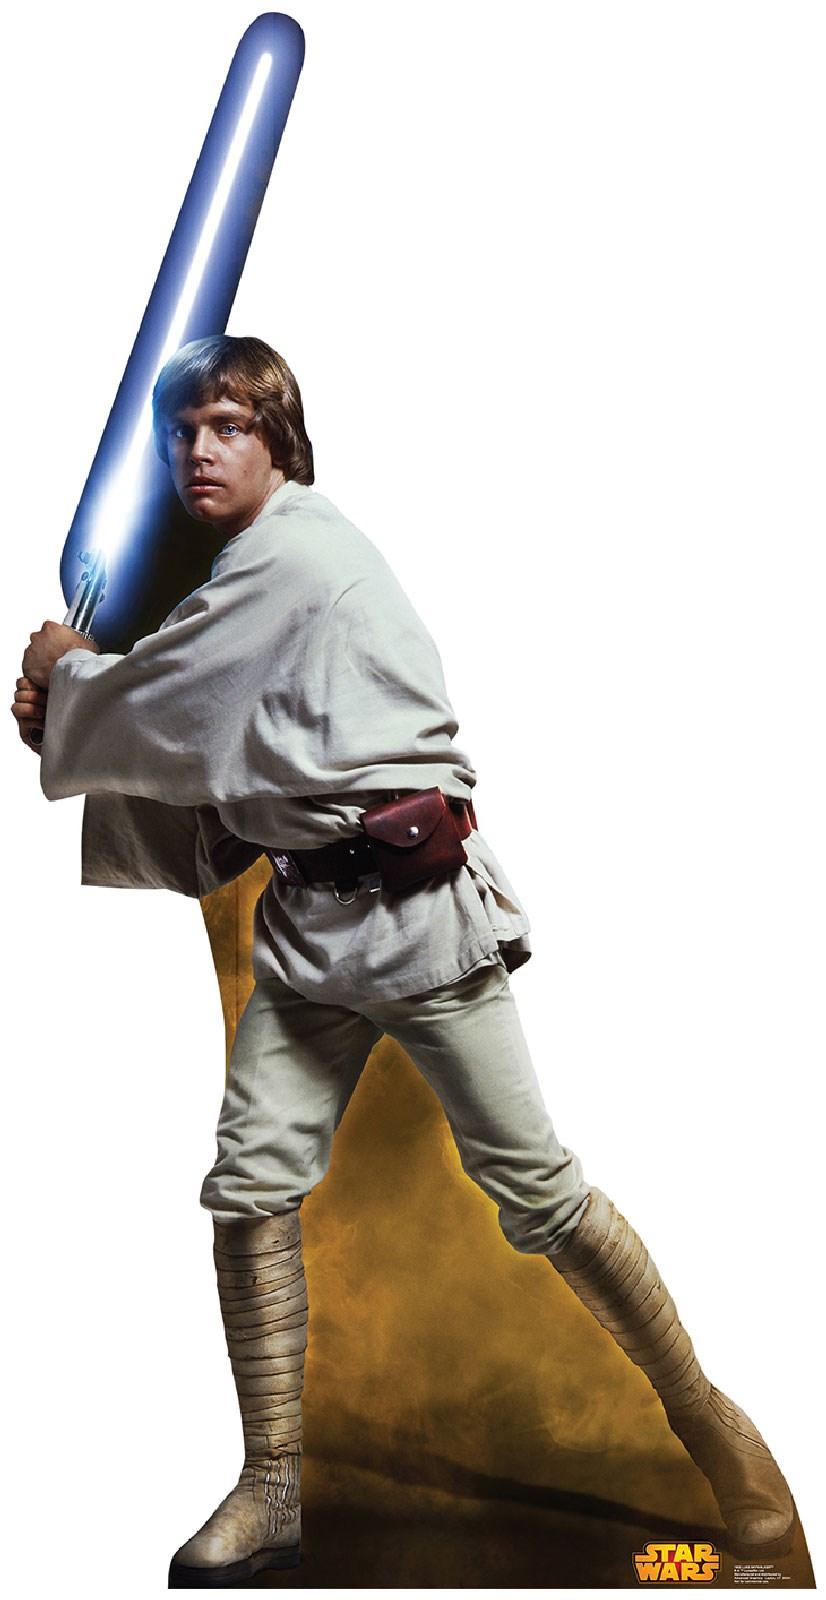 Star Wars Luke Skywalker Cardboard Stand Up 7.25